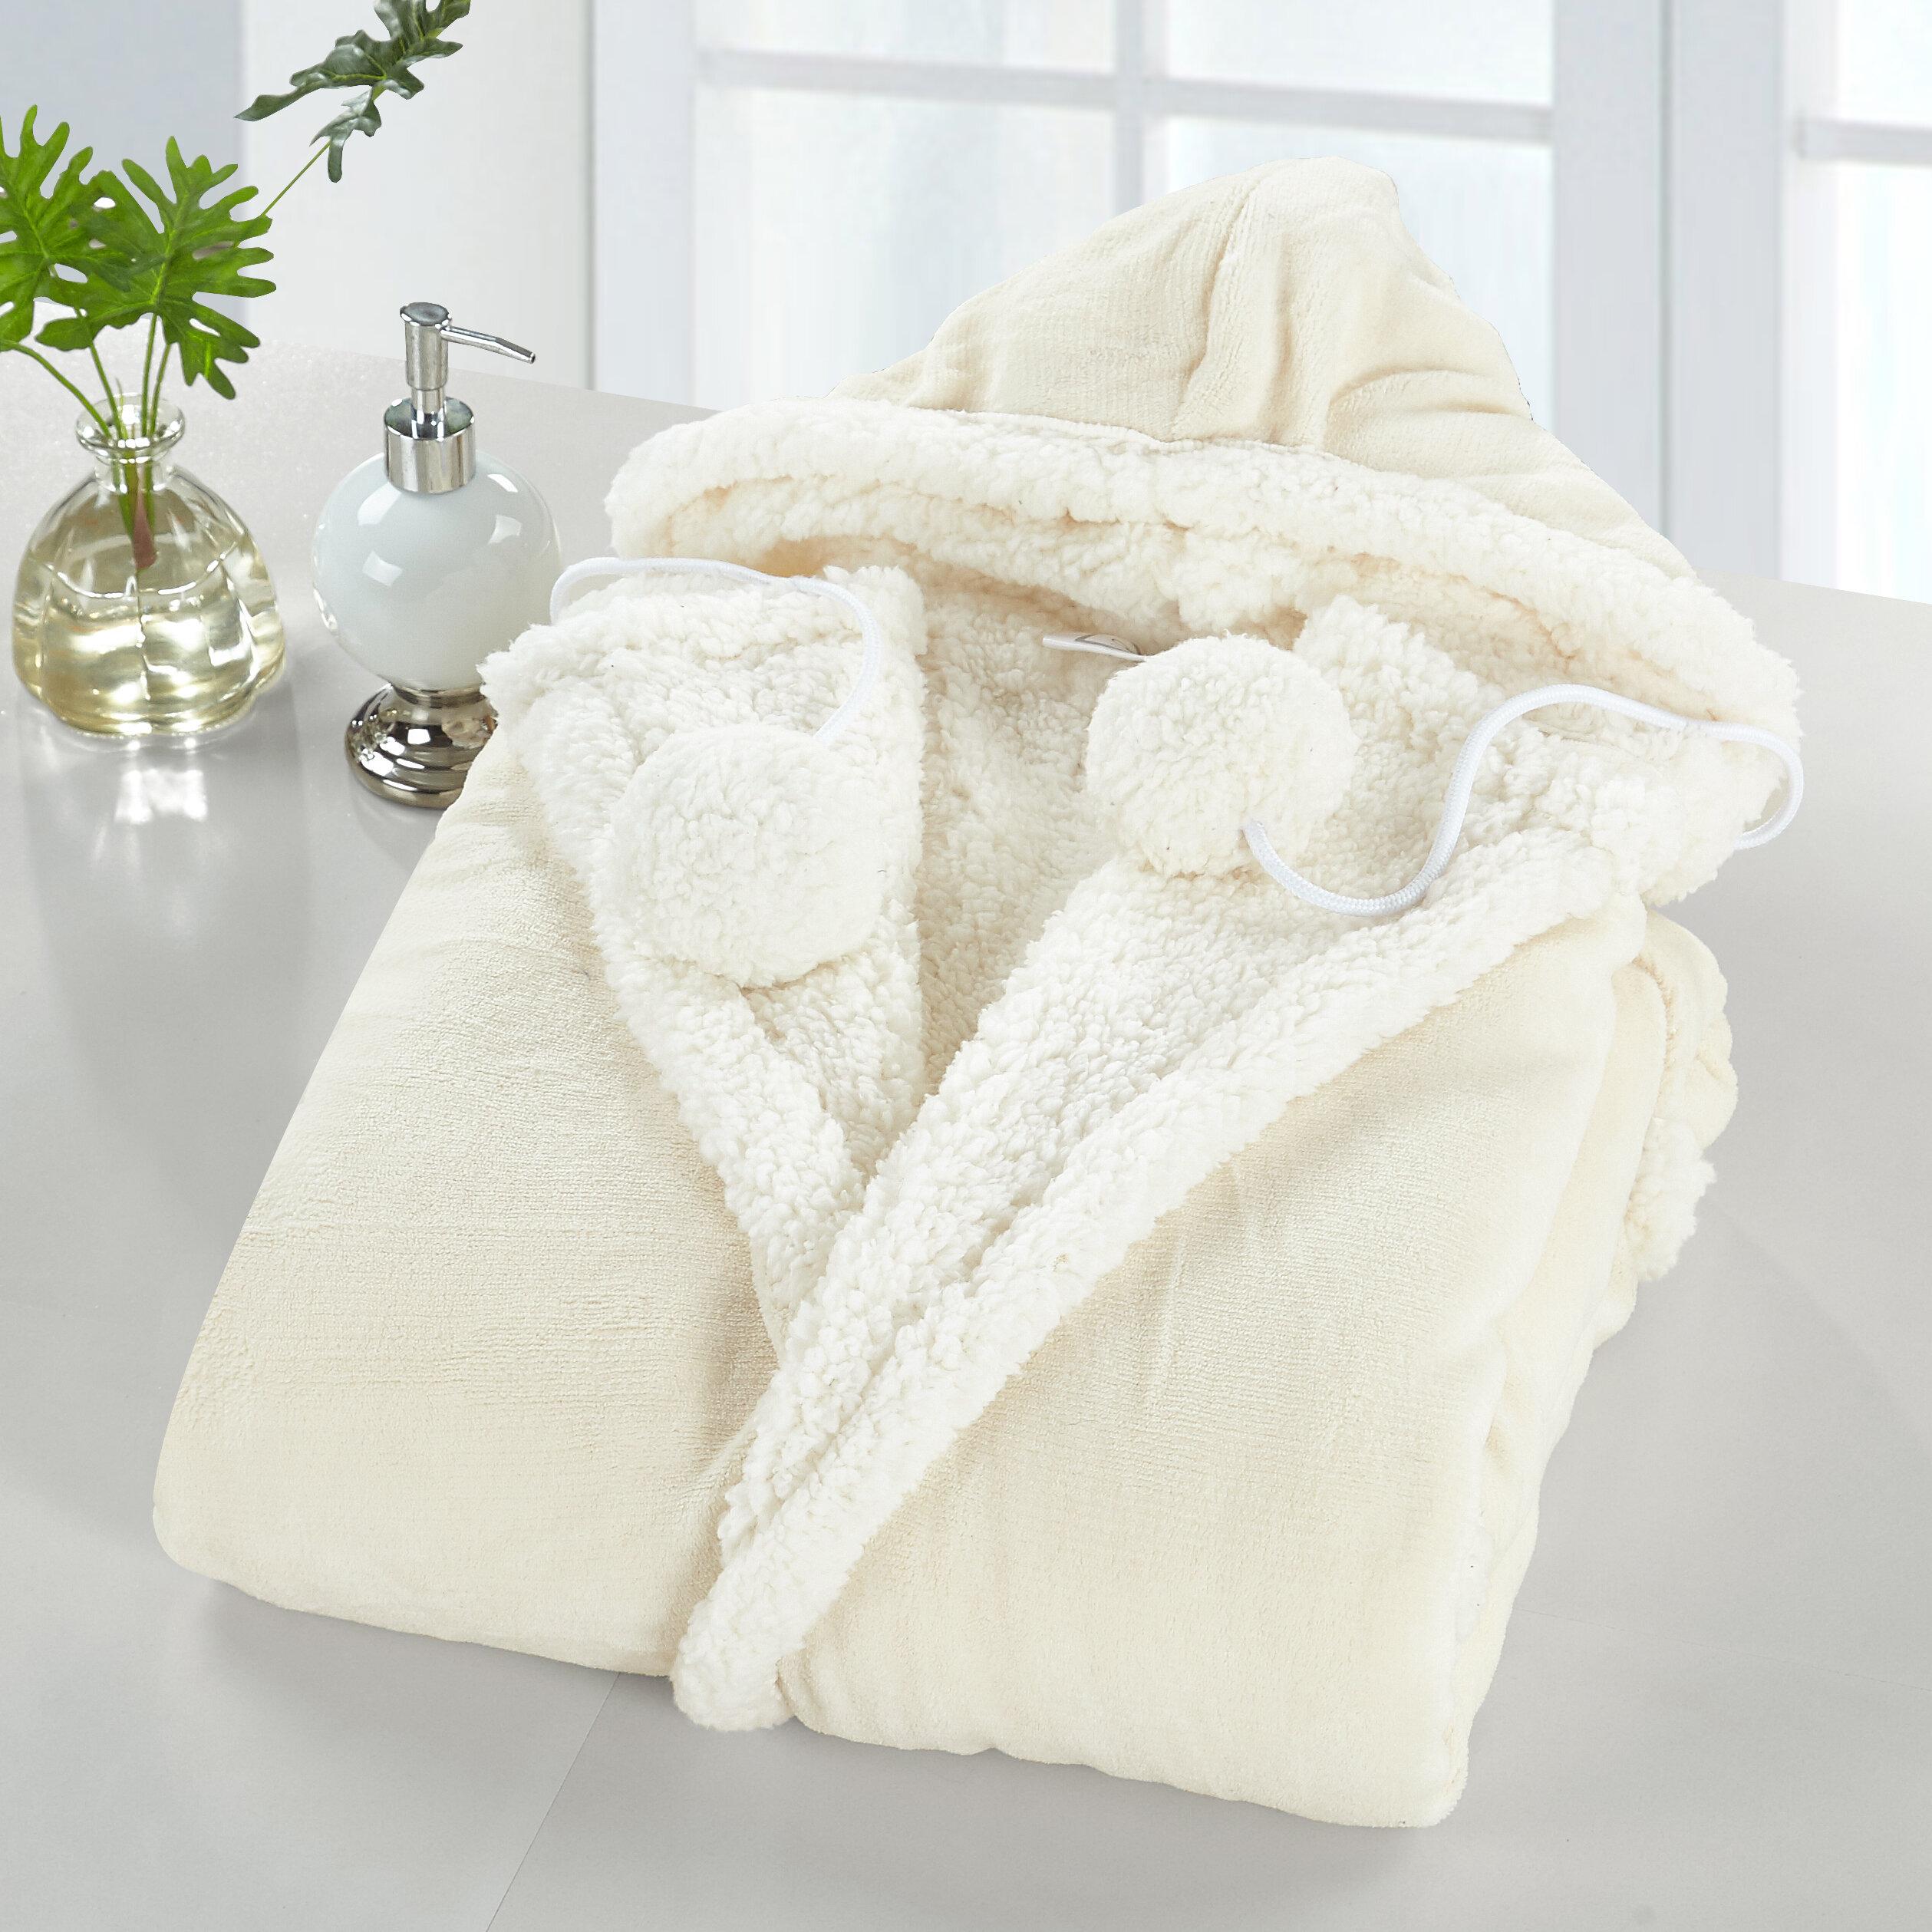 d51d4a3cf6 Gracie Oaks Maraiah Reversible Snuggle Hoodie   Reviews